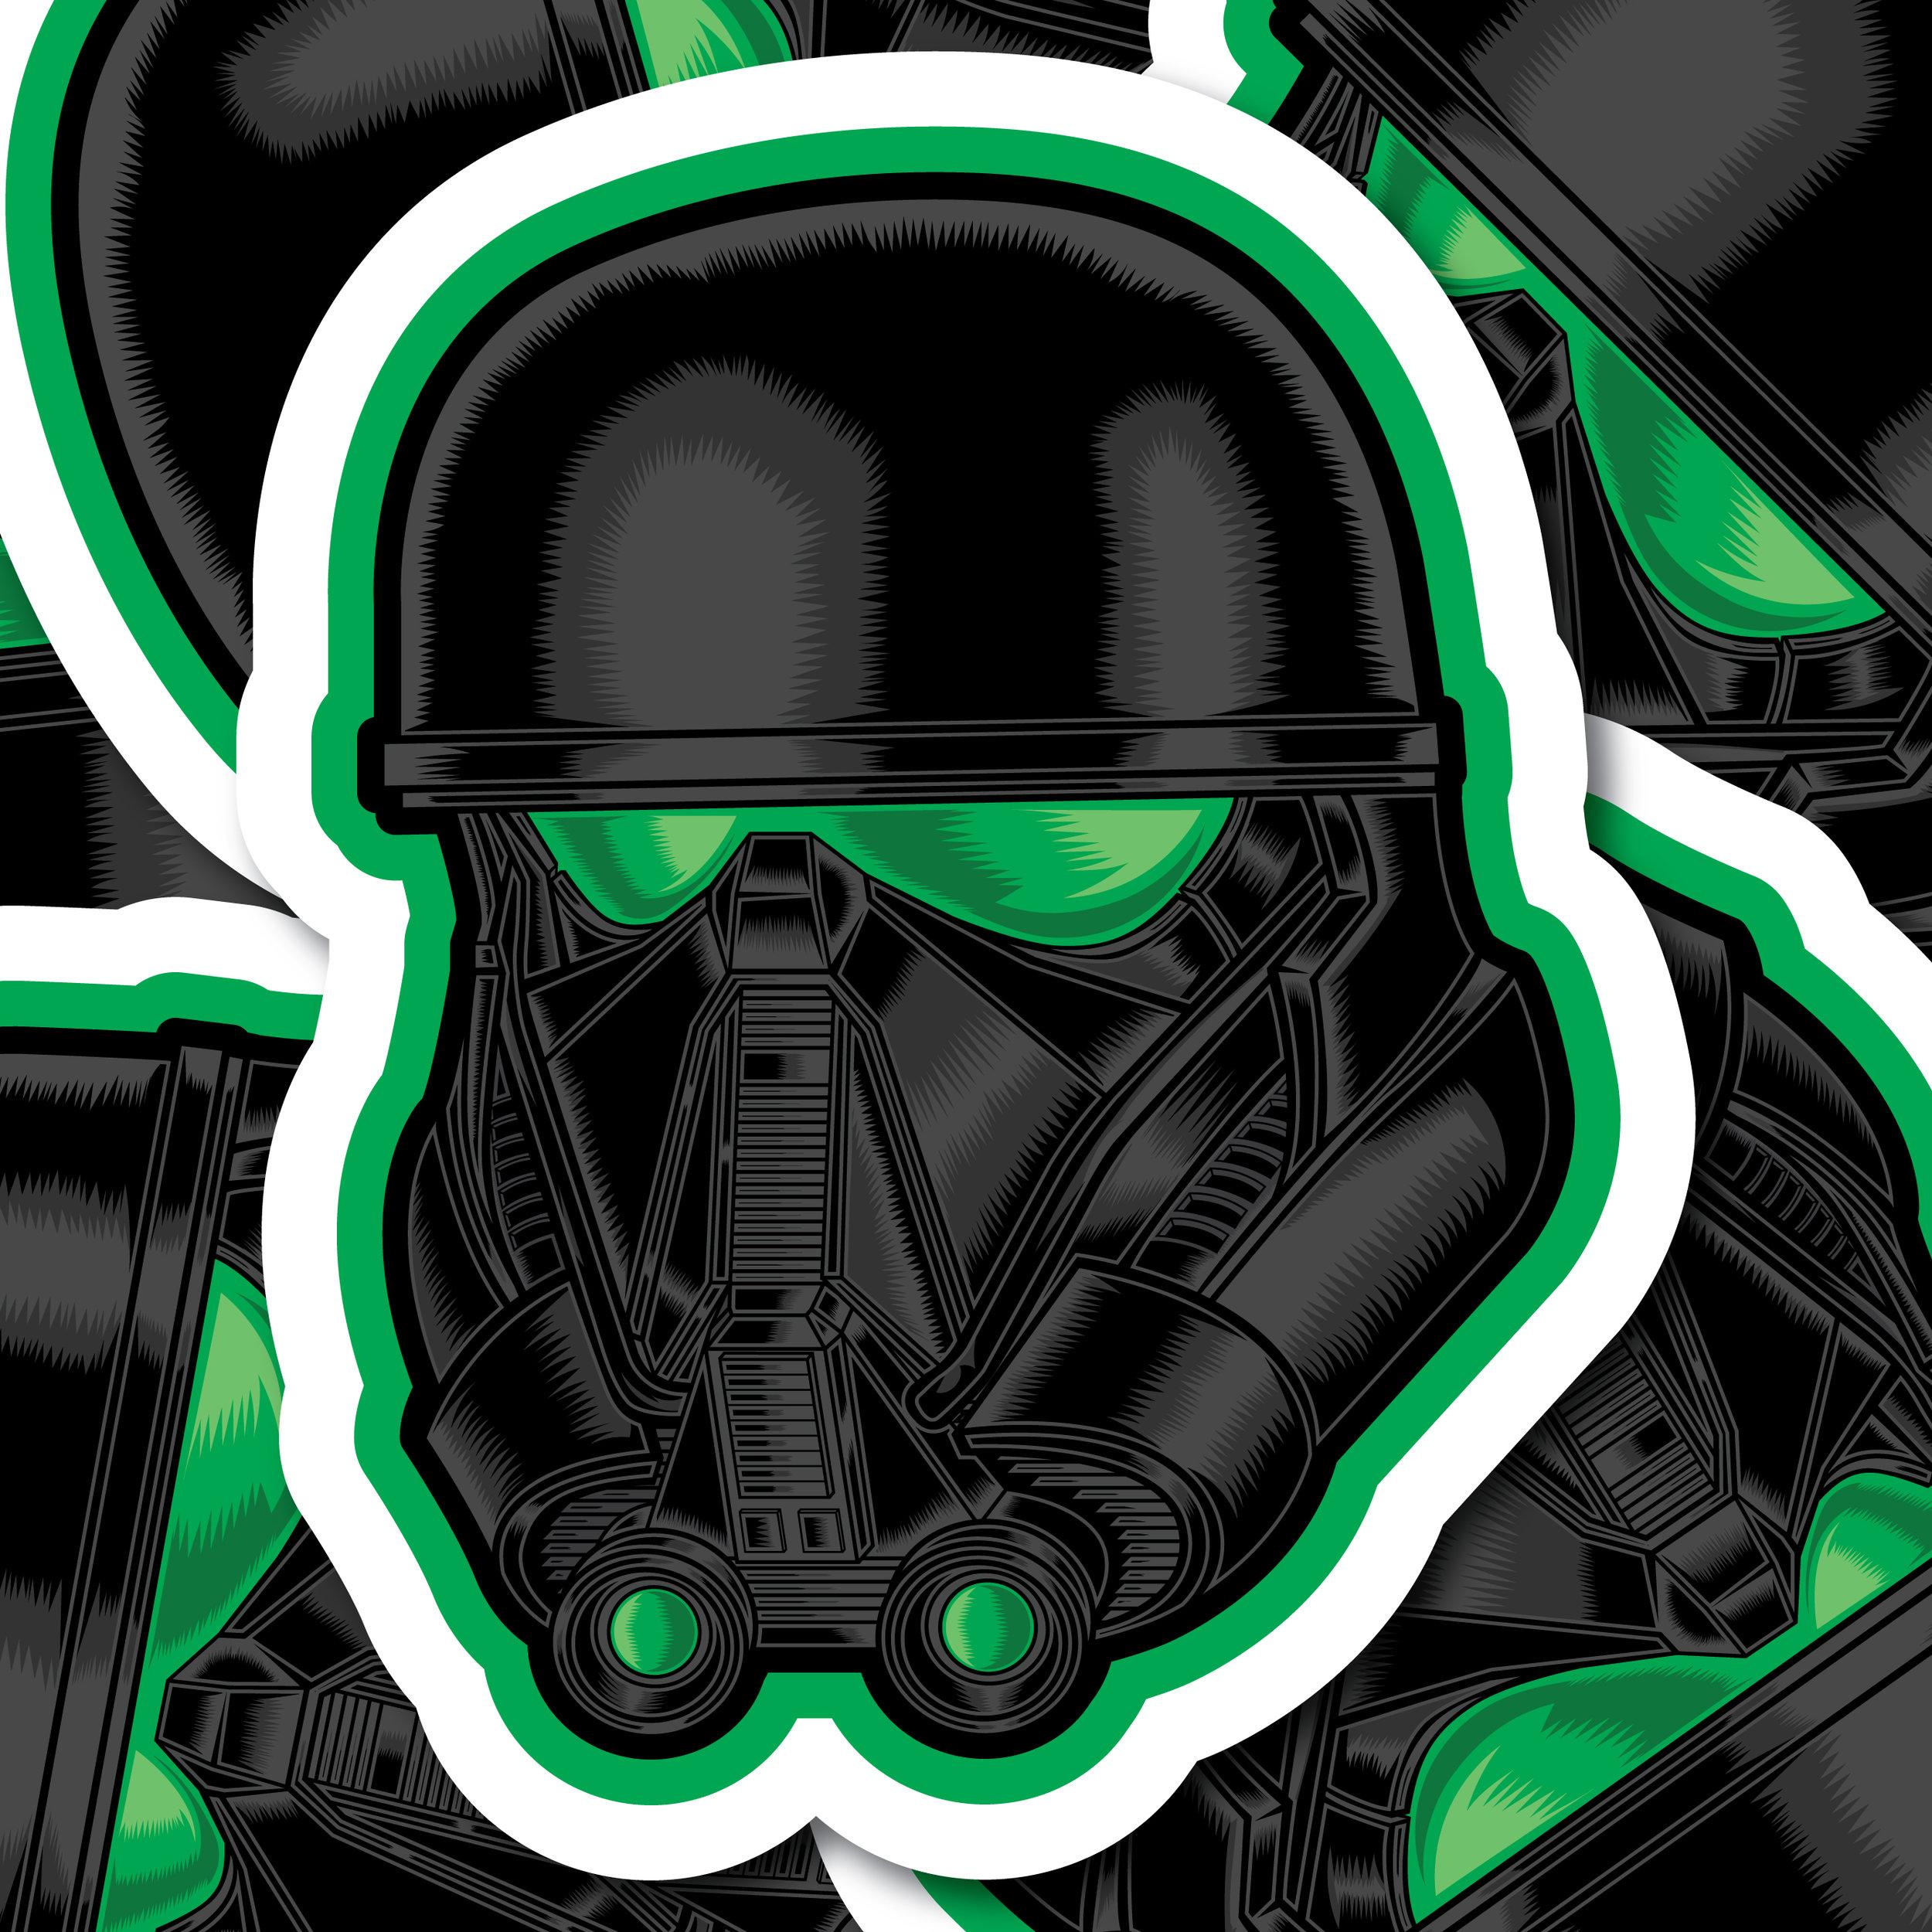 DeathTrooper-Social_3.jpg